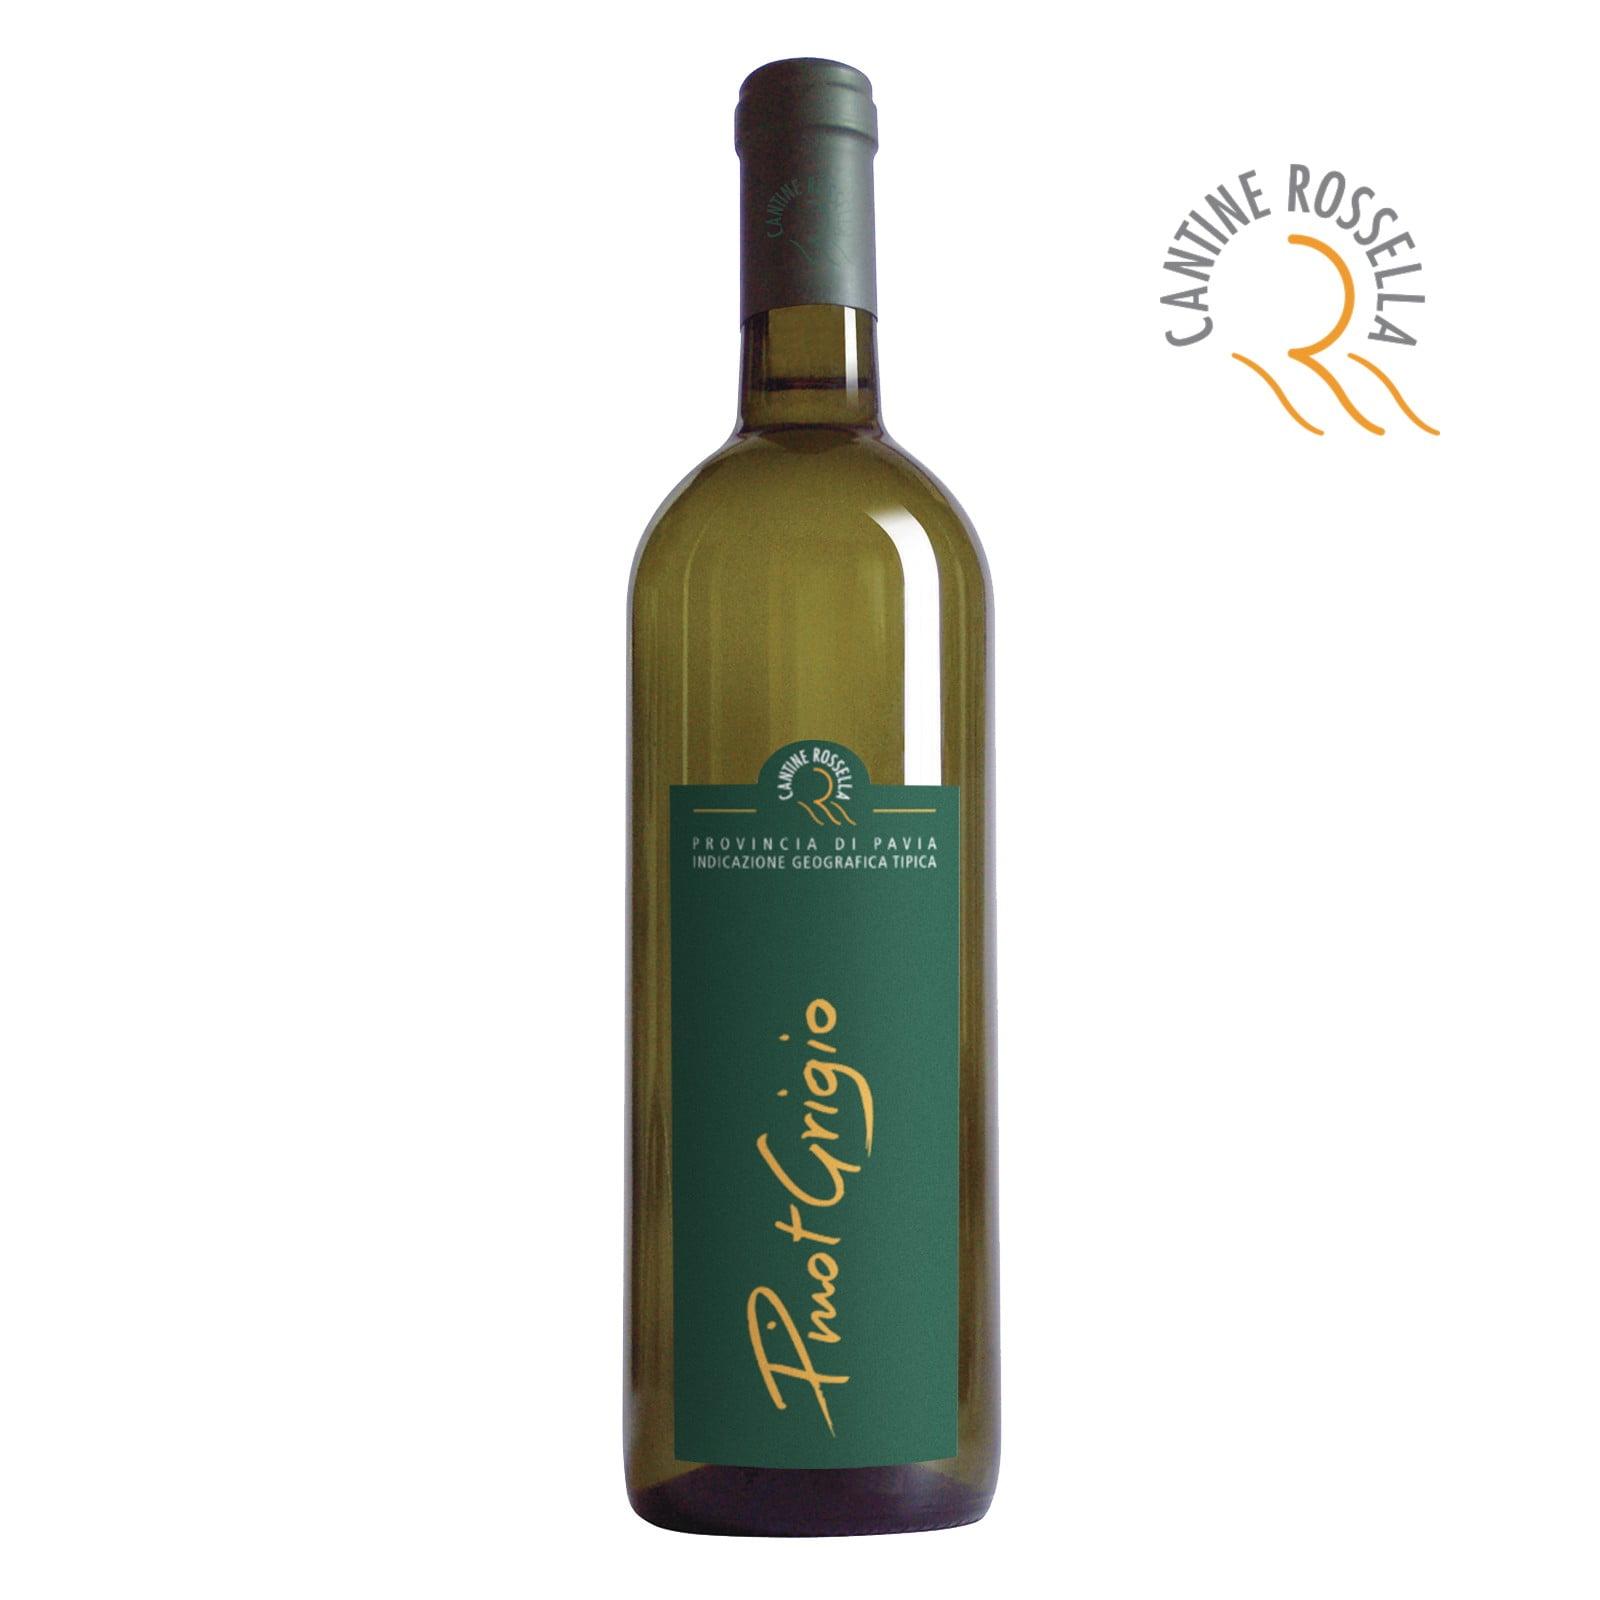 Provincia di Pavia IGT Pinot Grigio